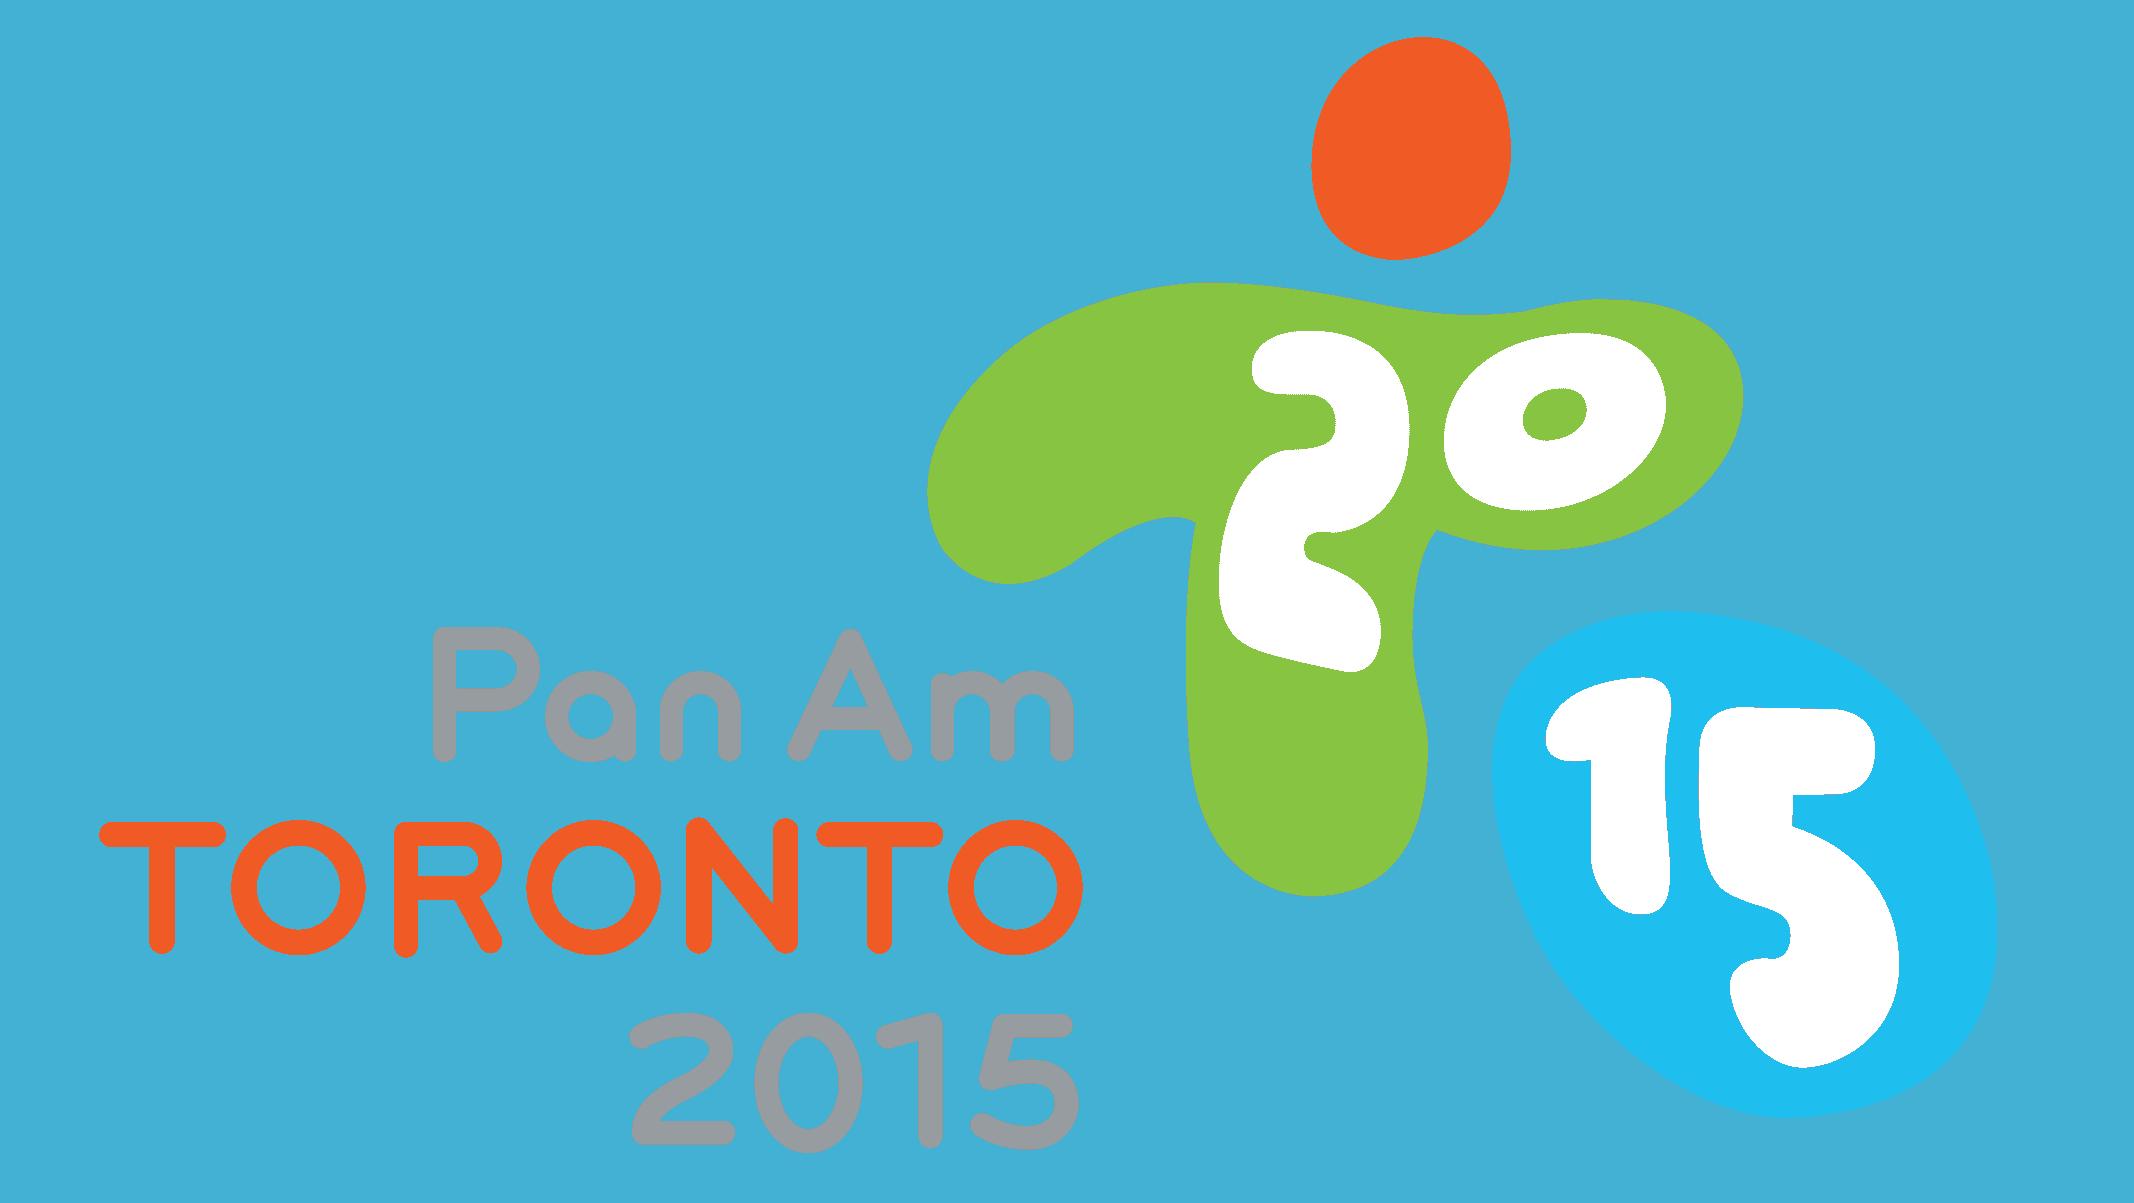 Pan-Am-Toronto-2015-Logo